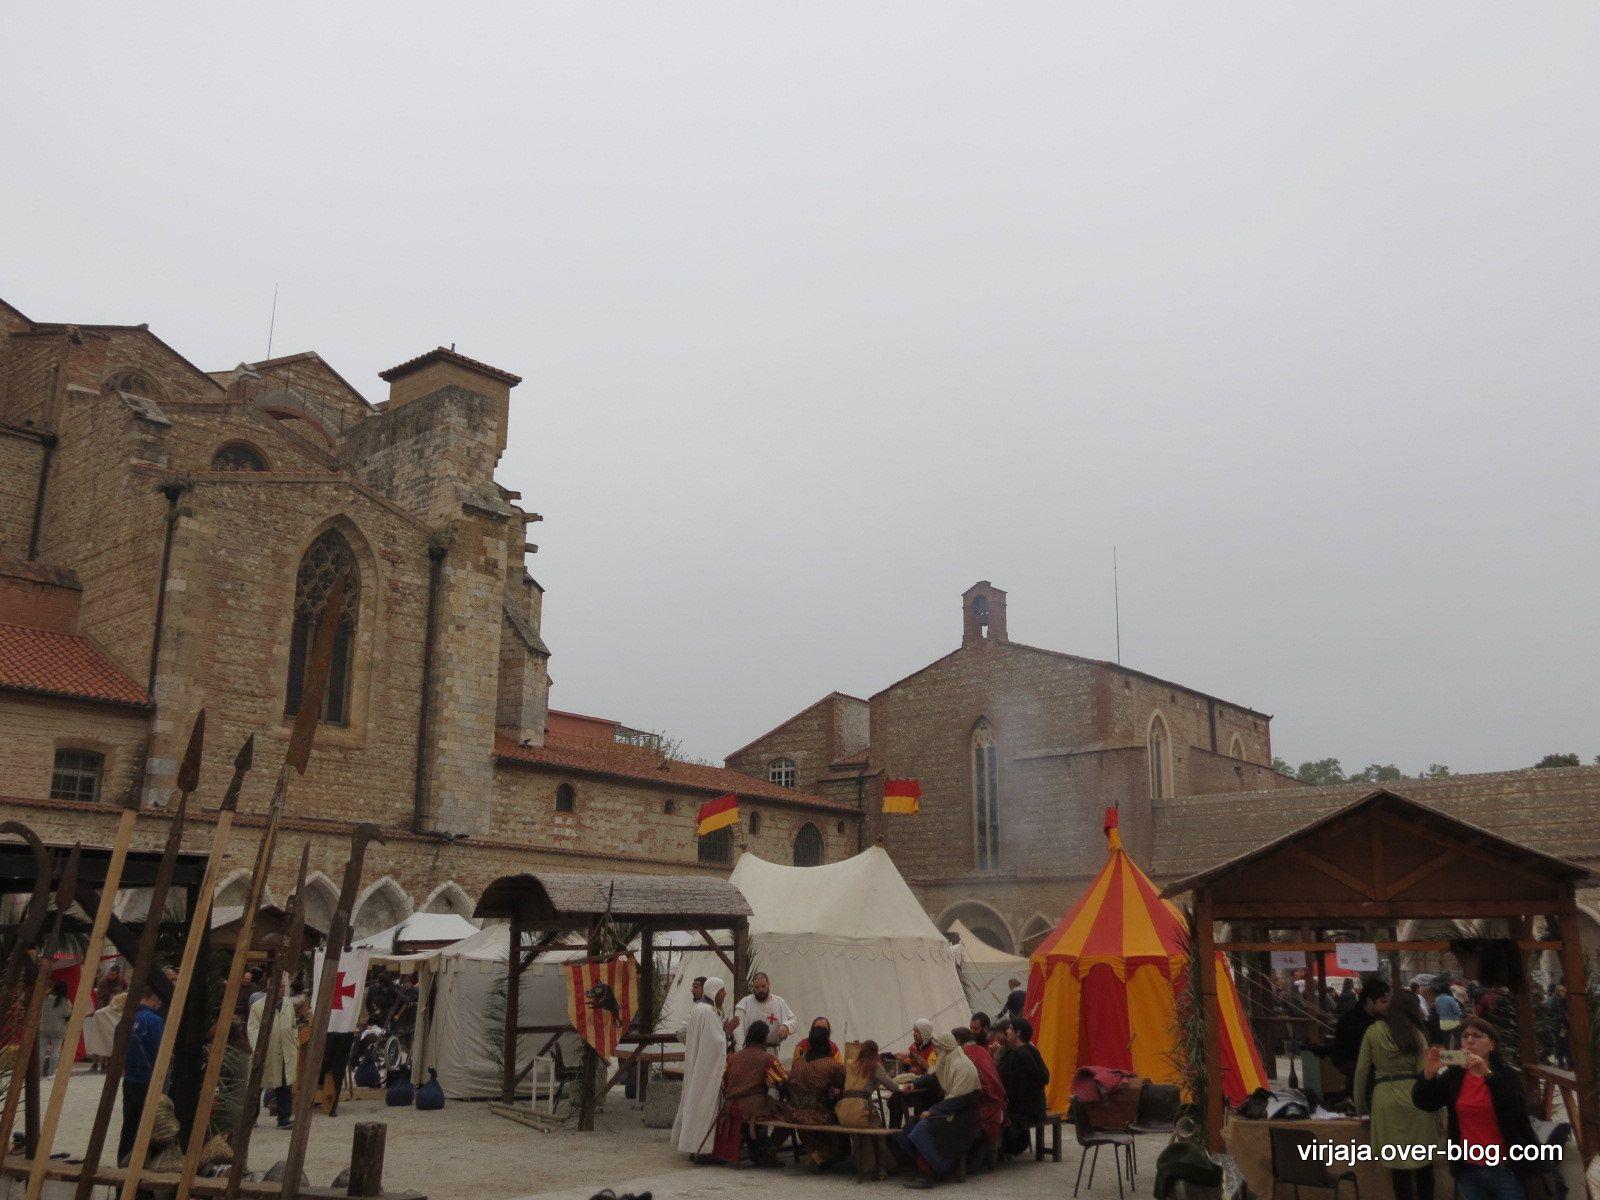 Trobades médiévales